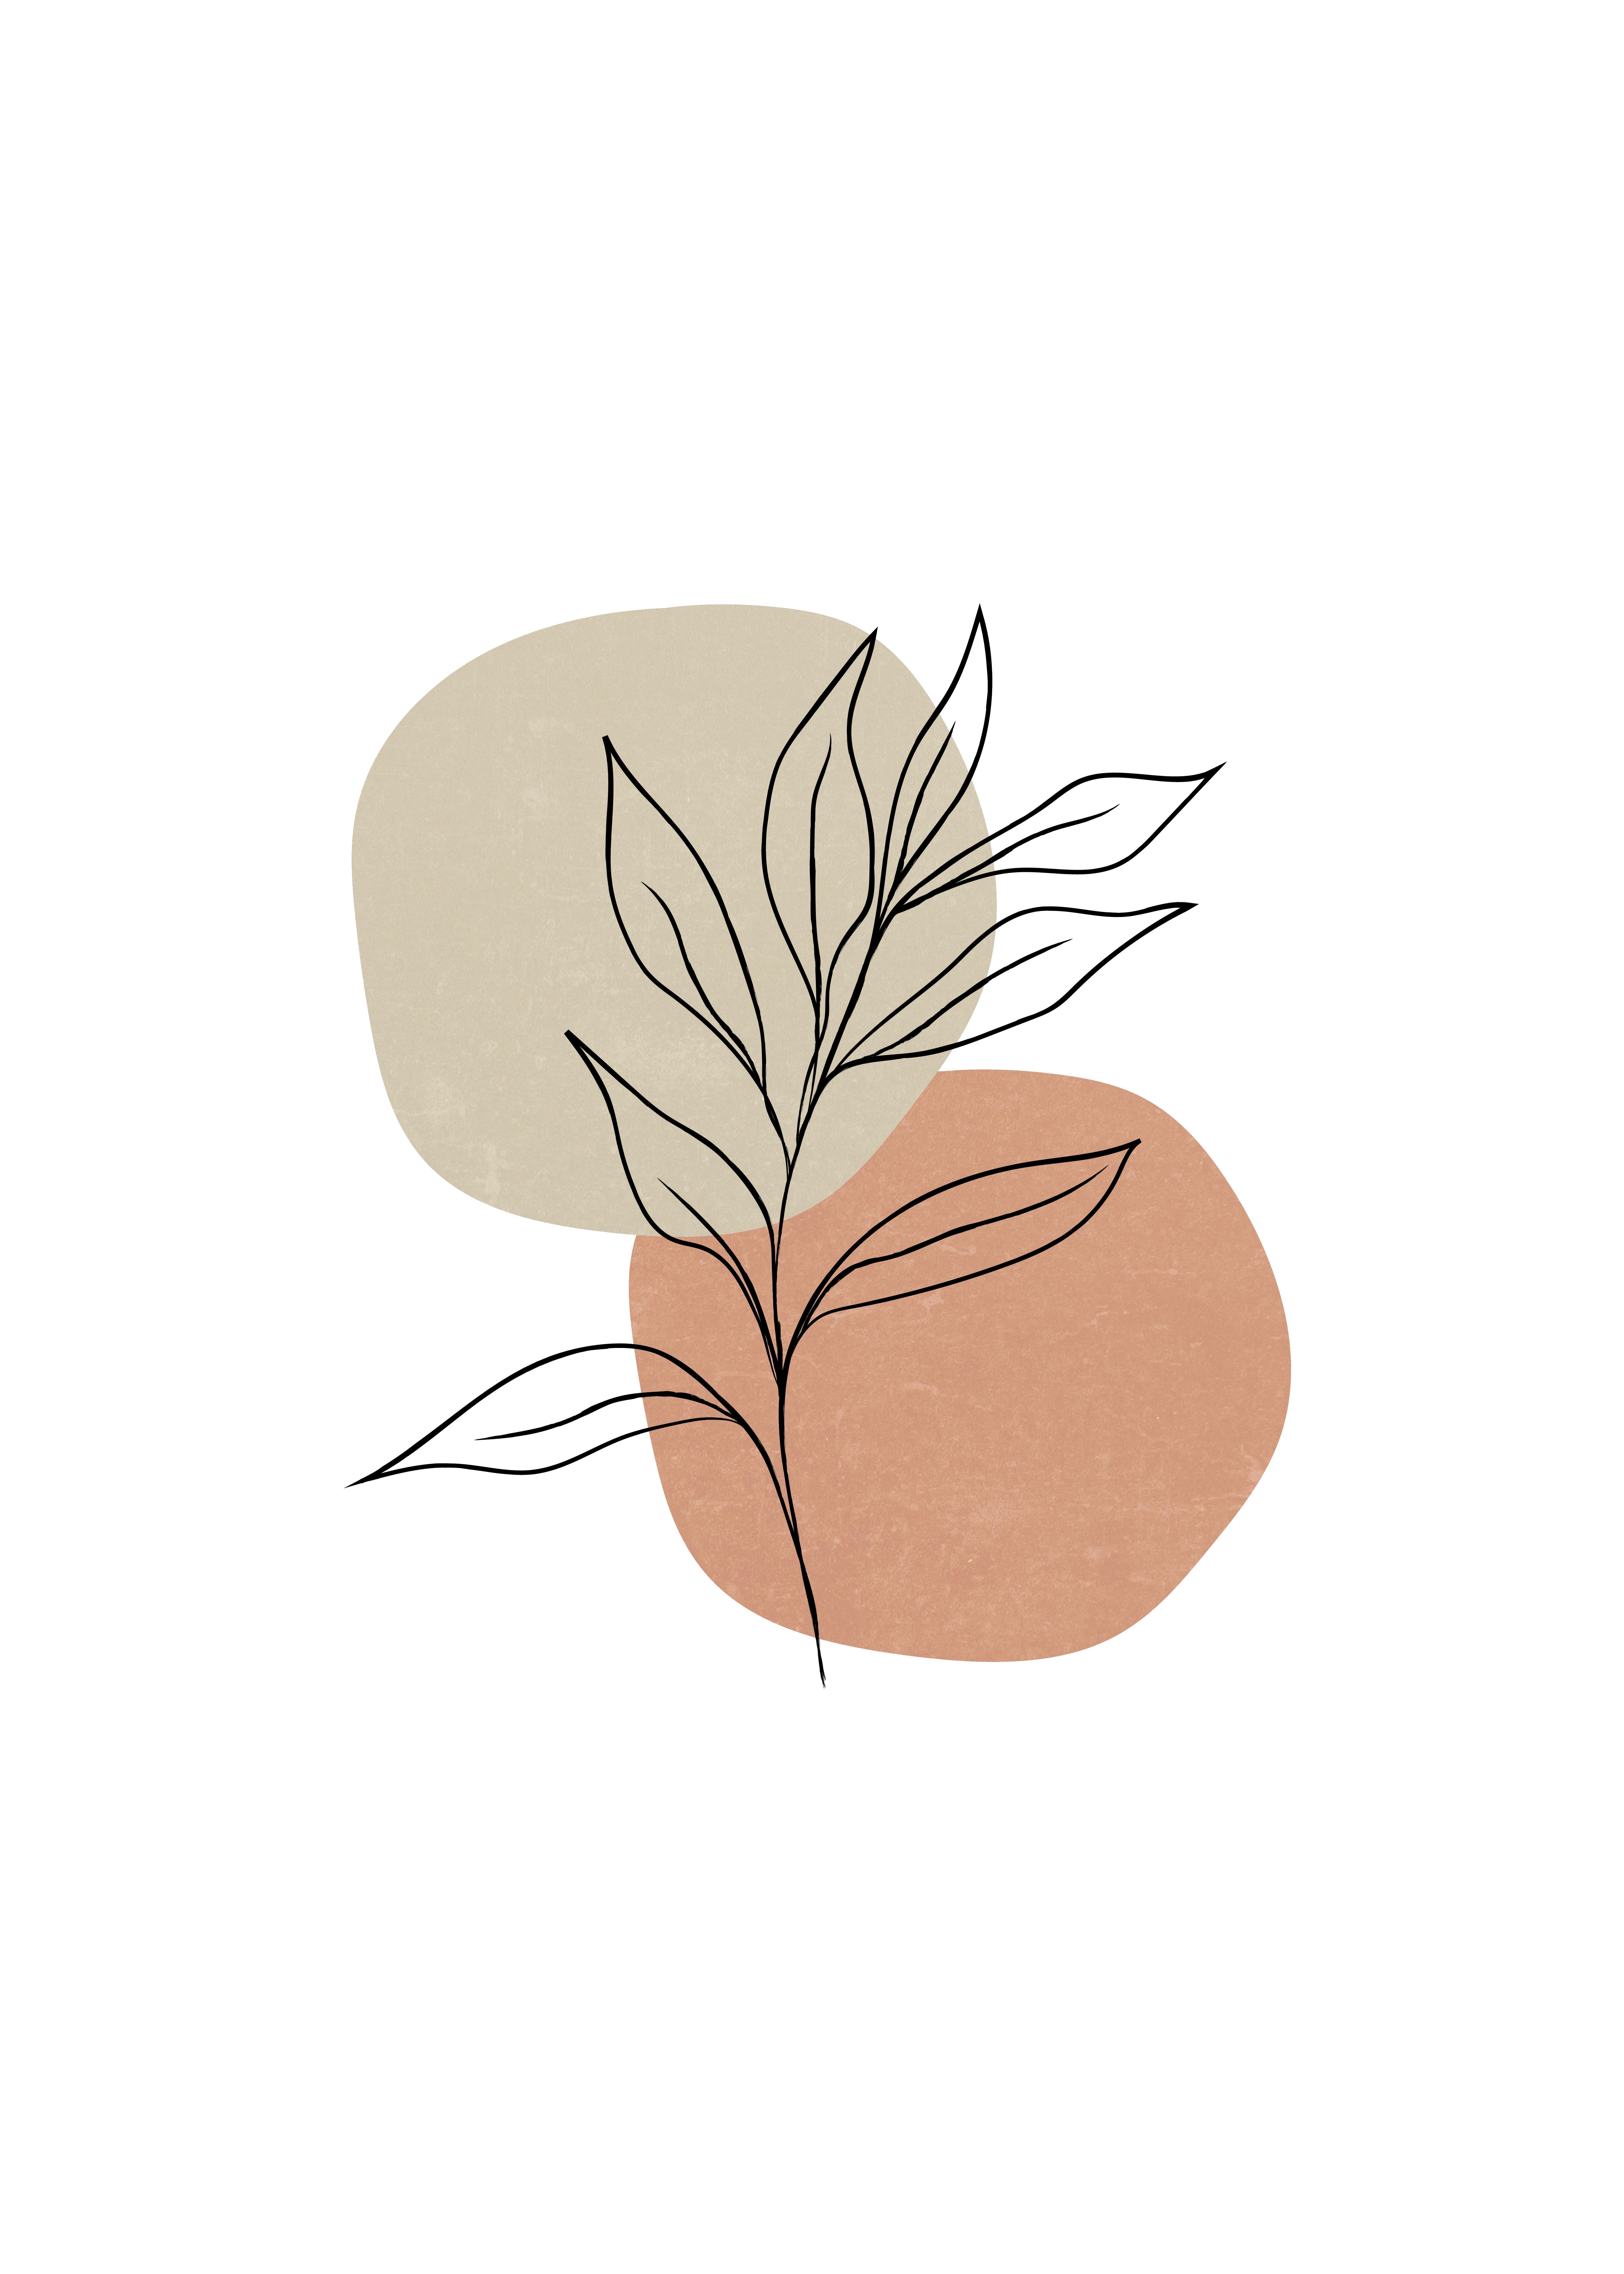 Minimalist Plant Art   Botanical Art Print   Minimalist Wall Decor   Printable Wall Art   Digital